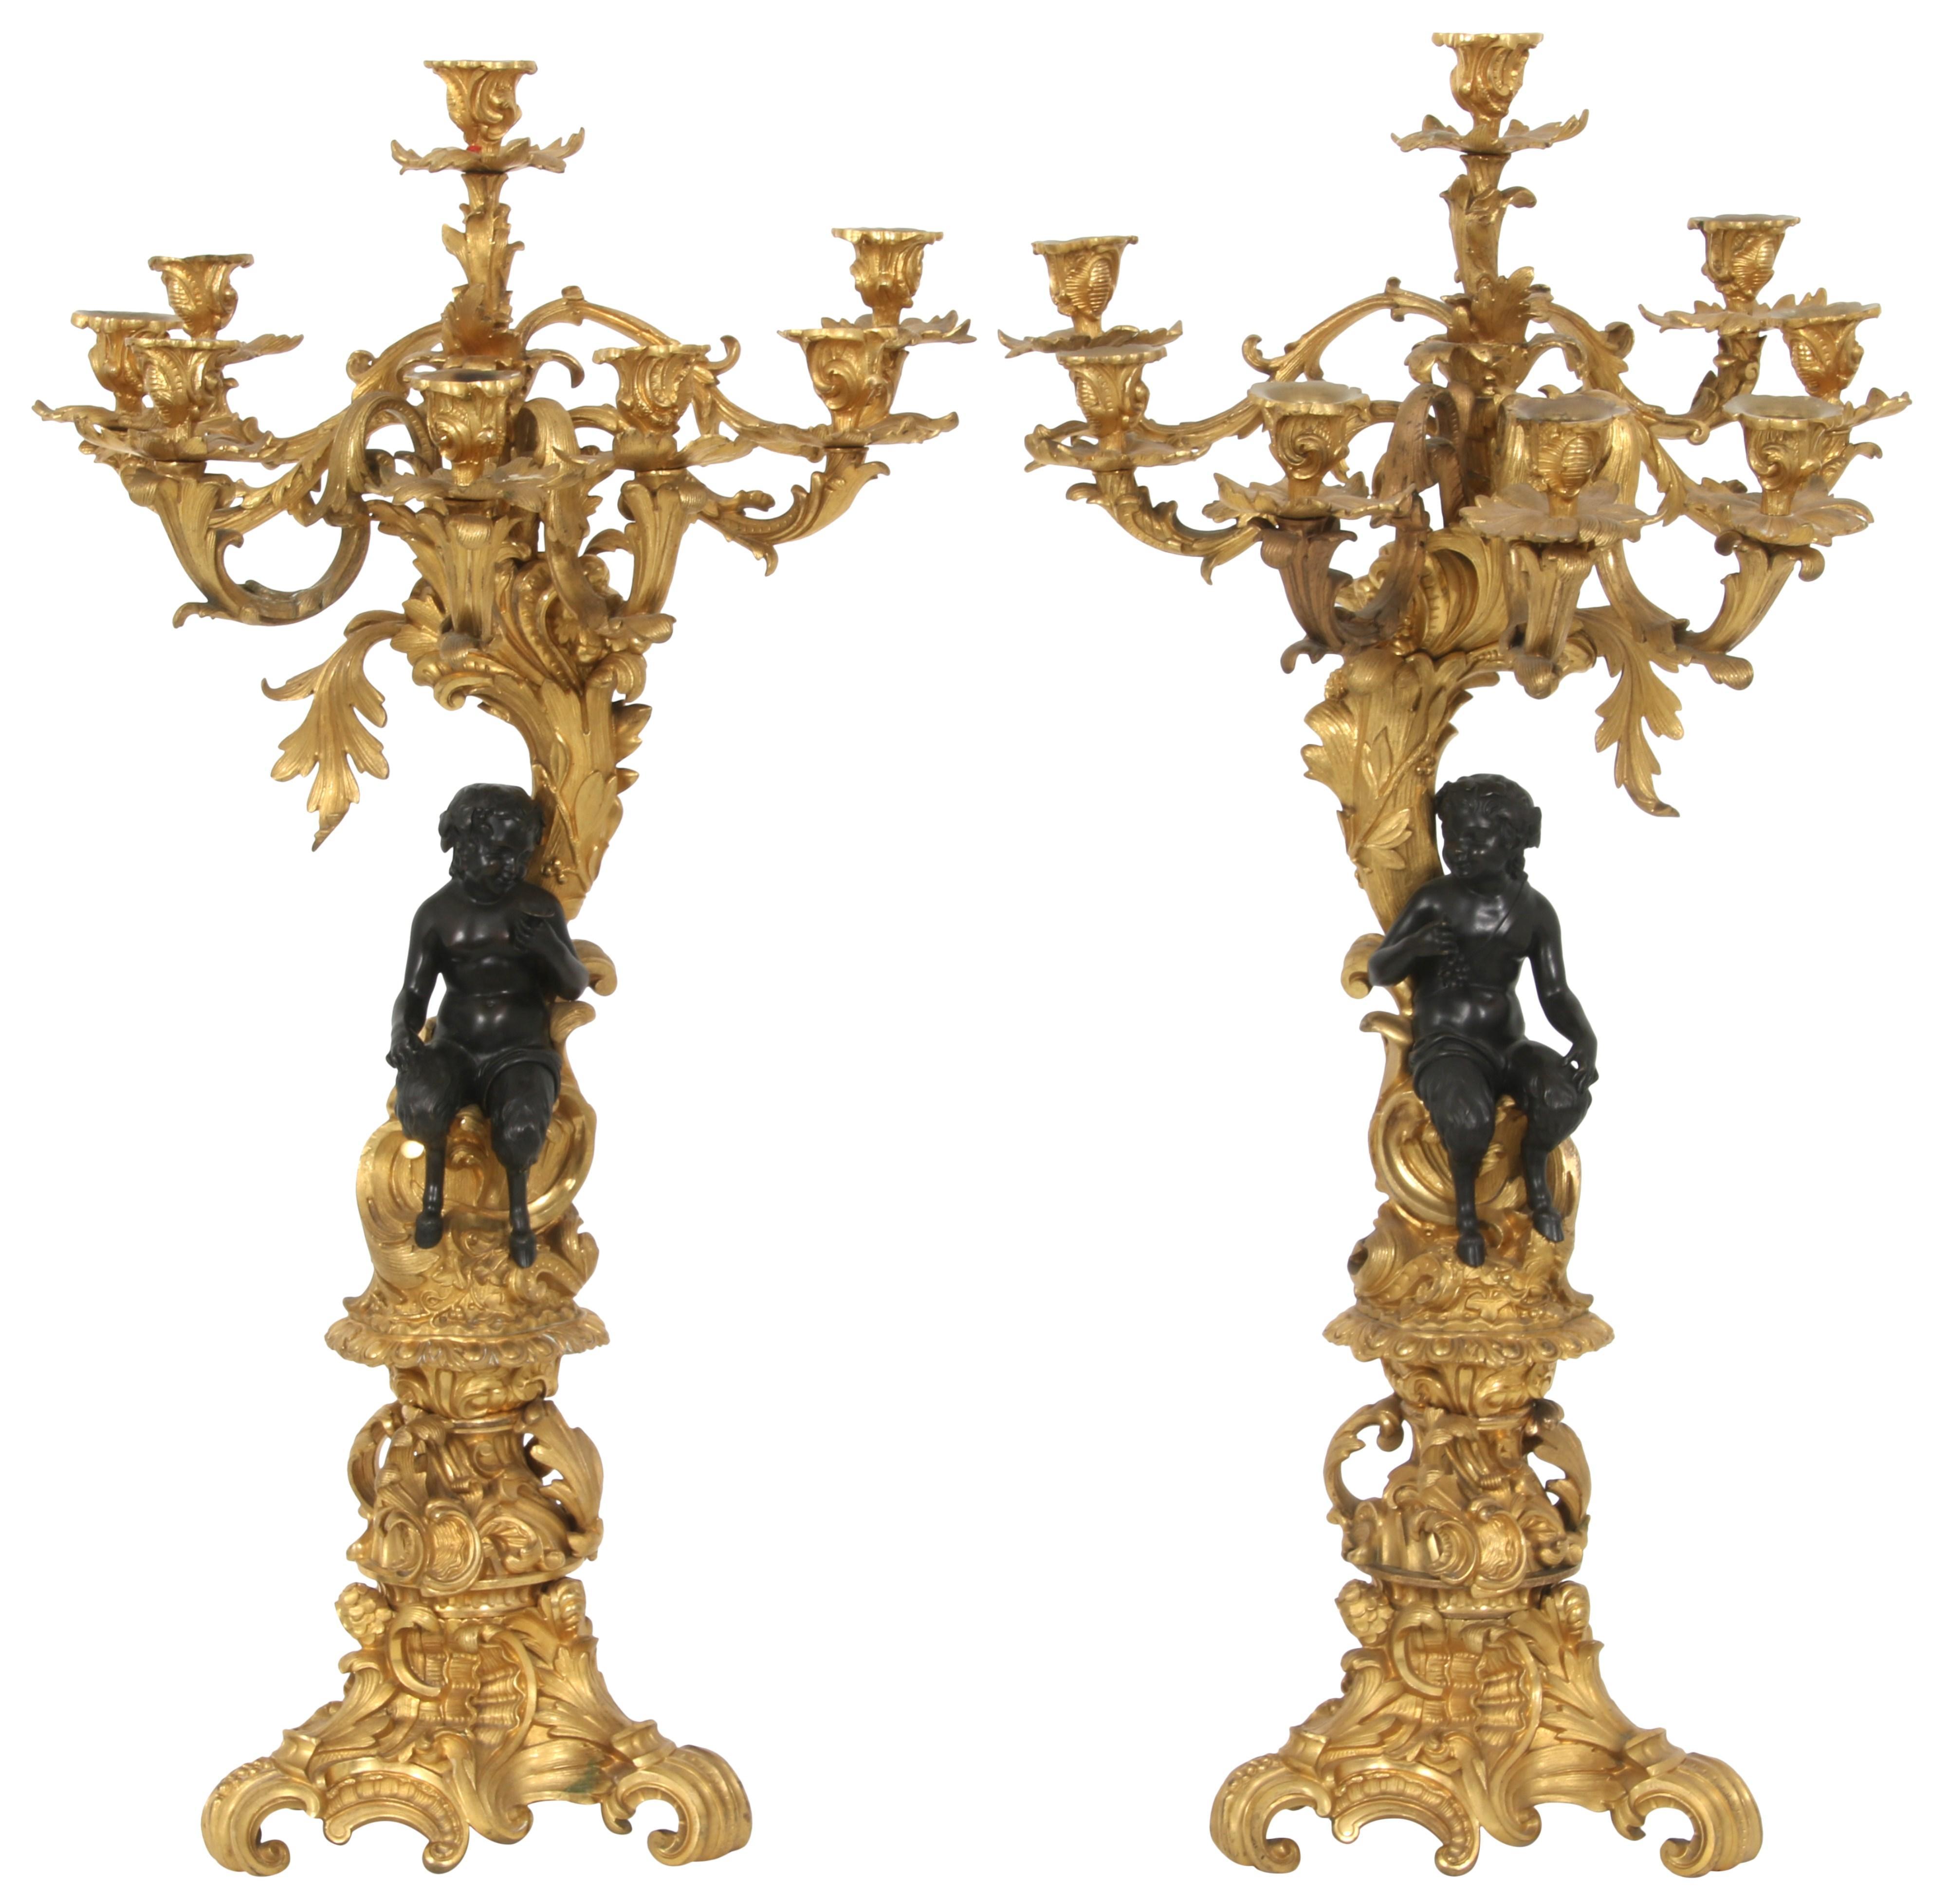 Pair of Louis XV Style Seven-Light Candelabra